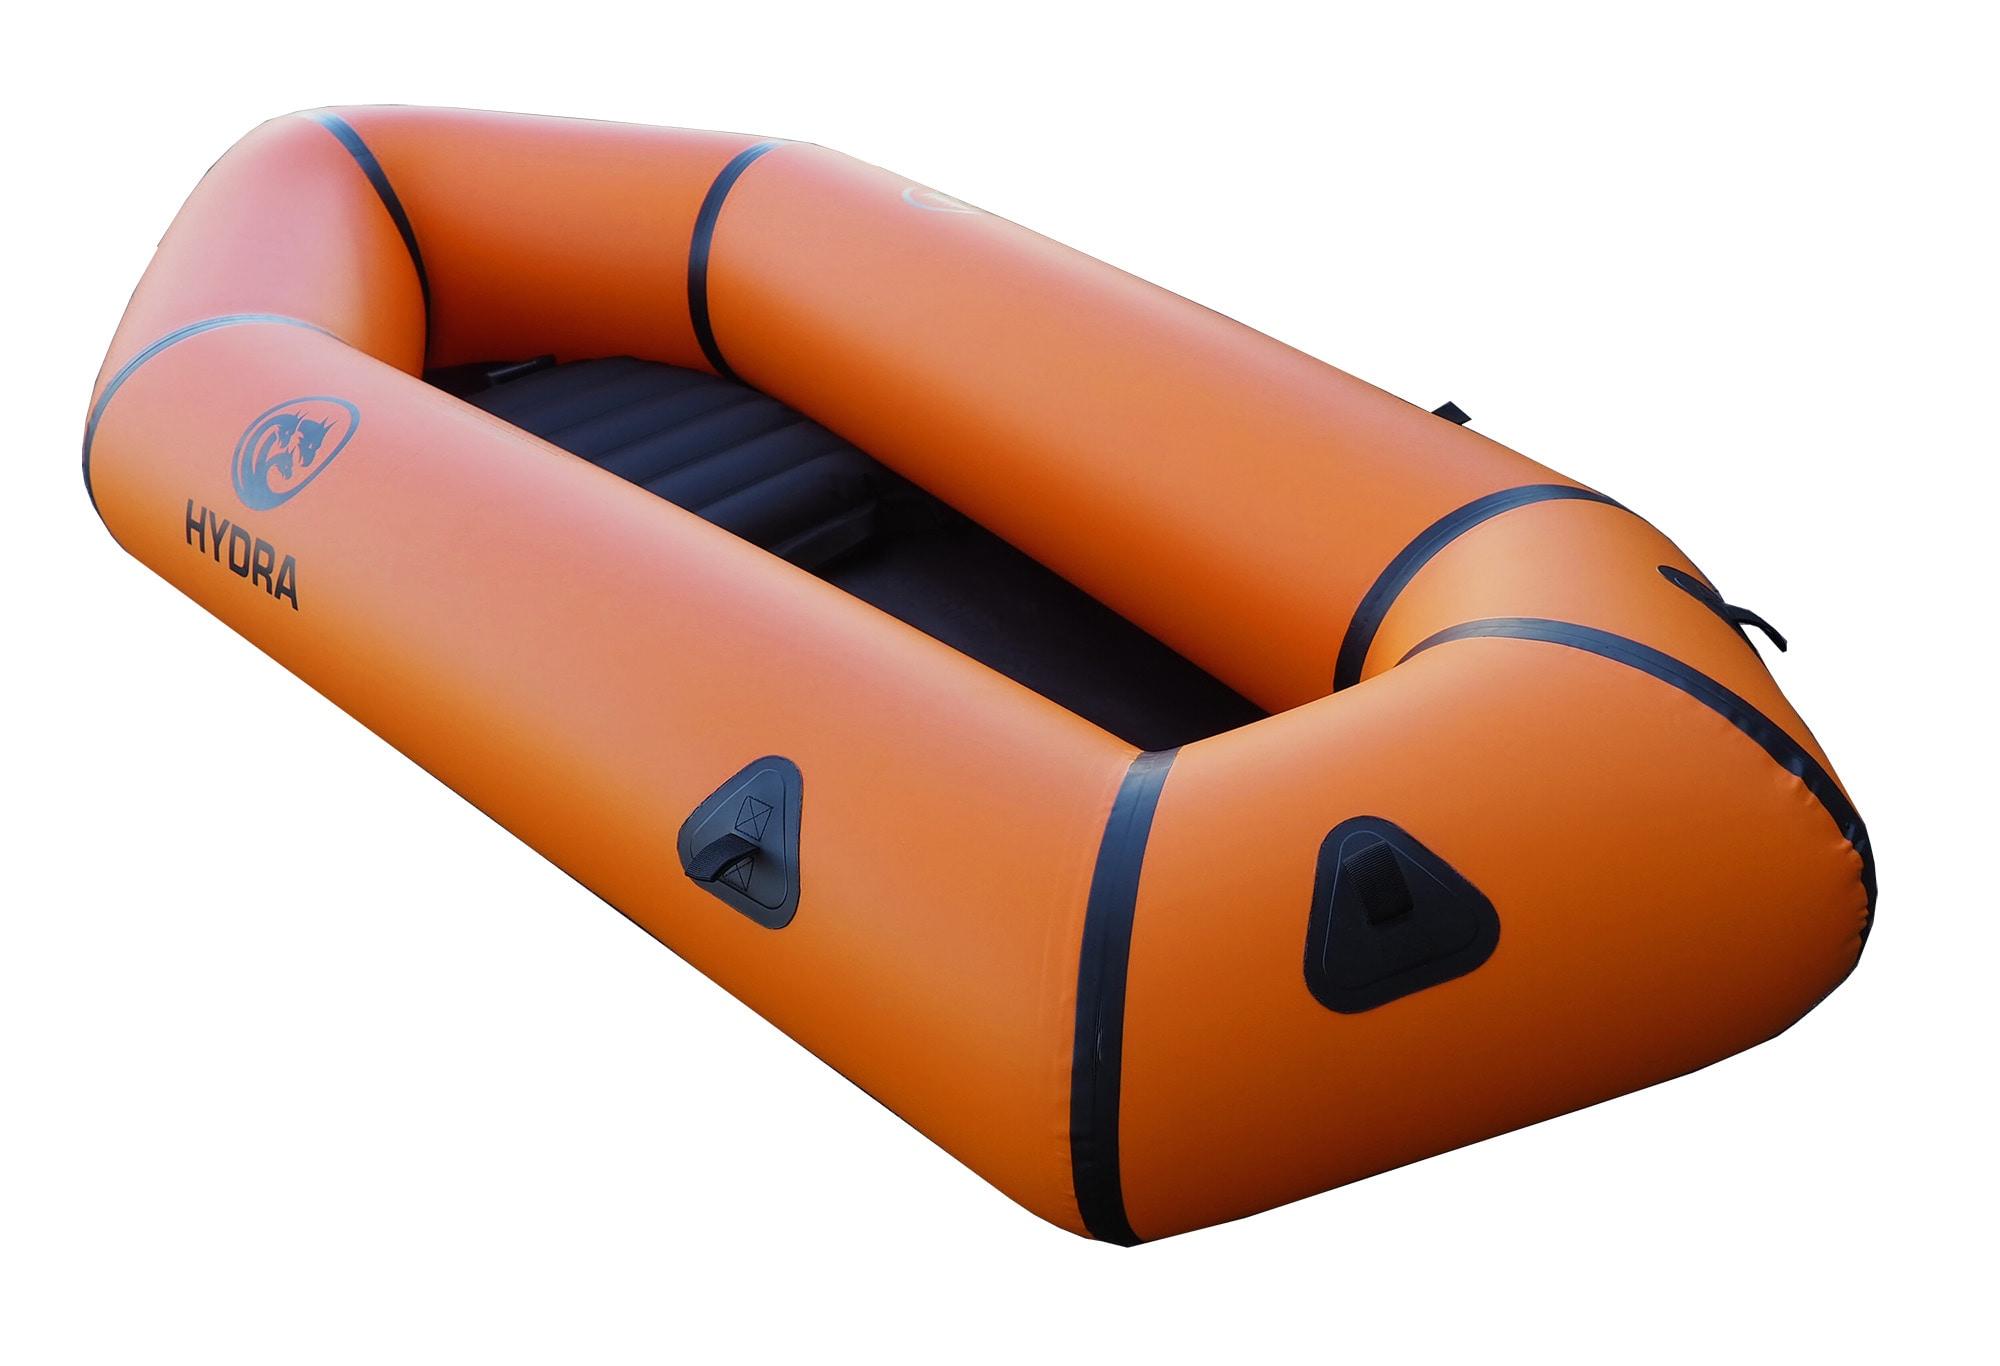 Hydra Packraft